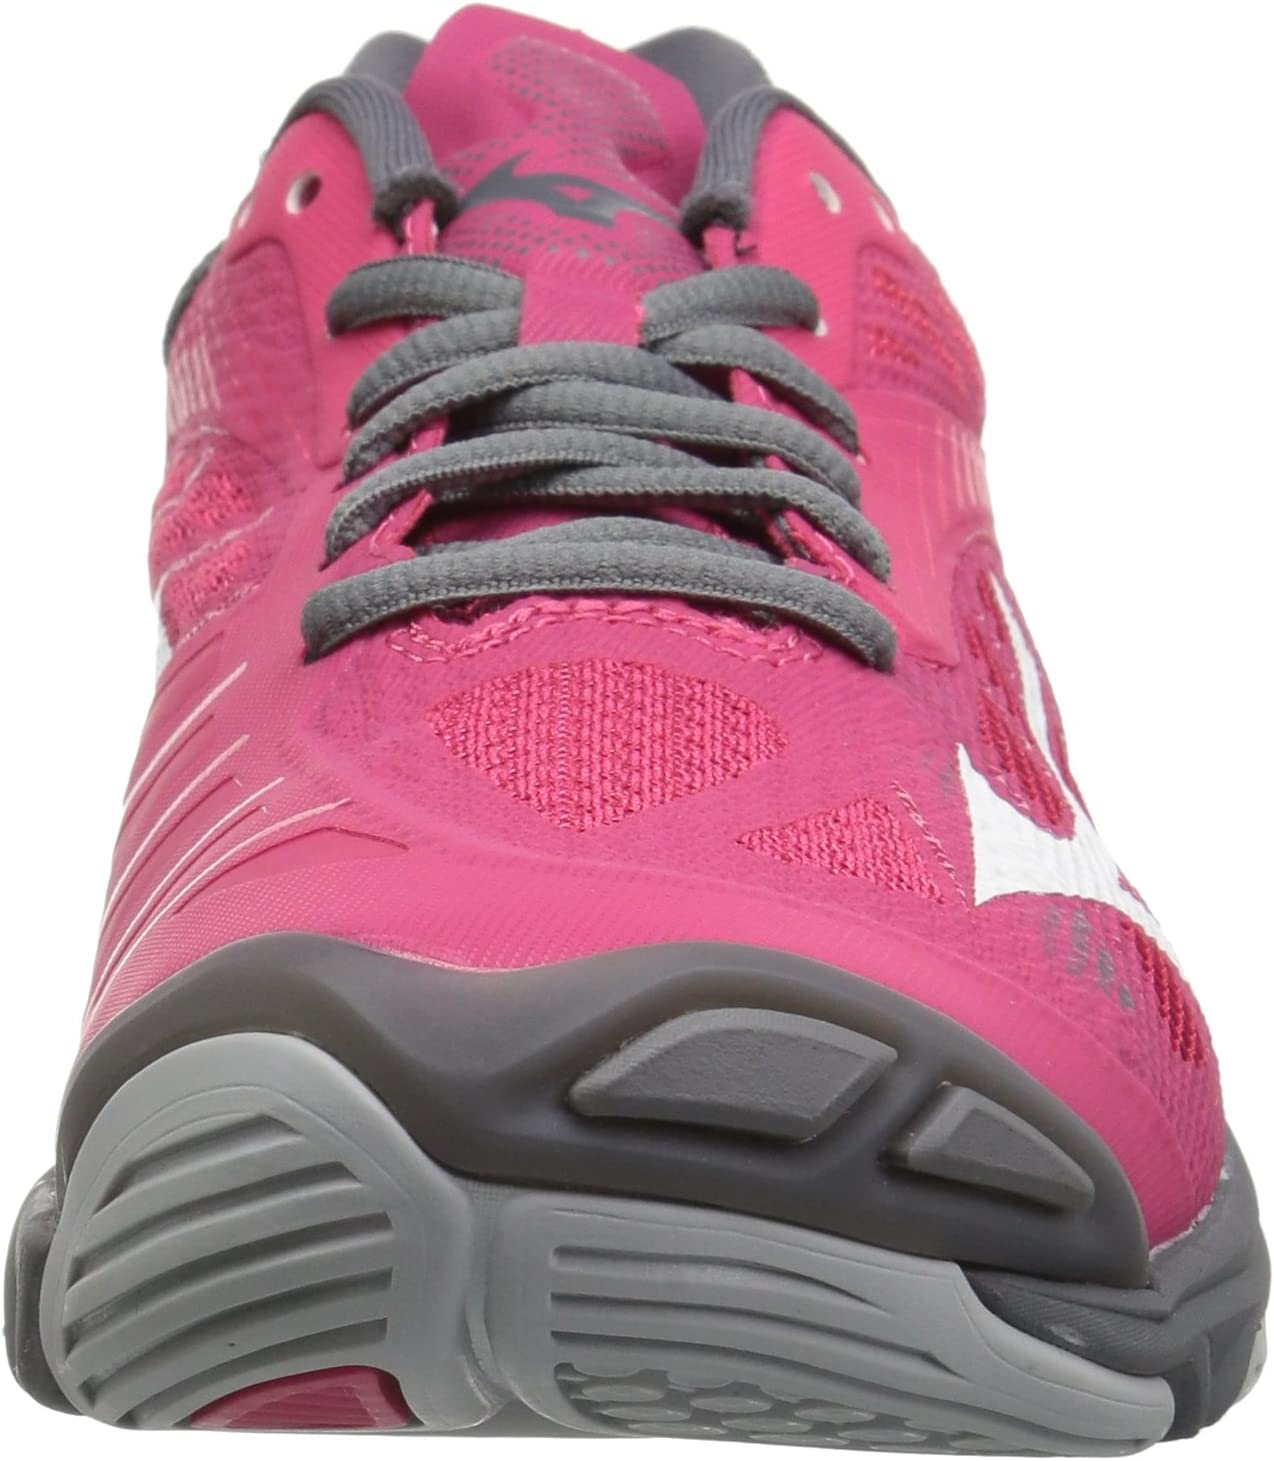 Mizuno Womens Wave Lightning Z4 Volleyball Shoes Footwear